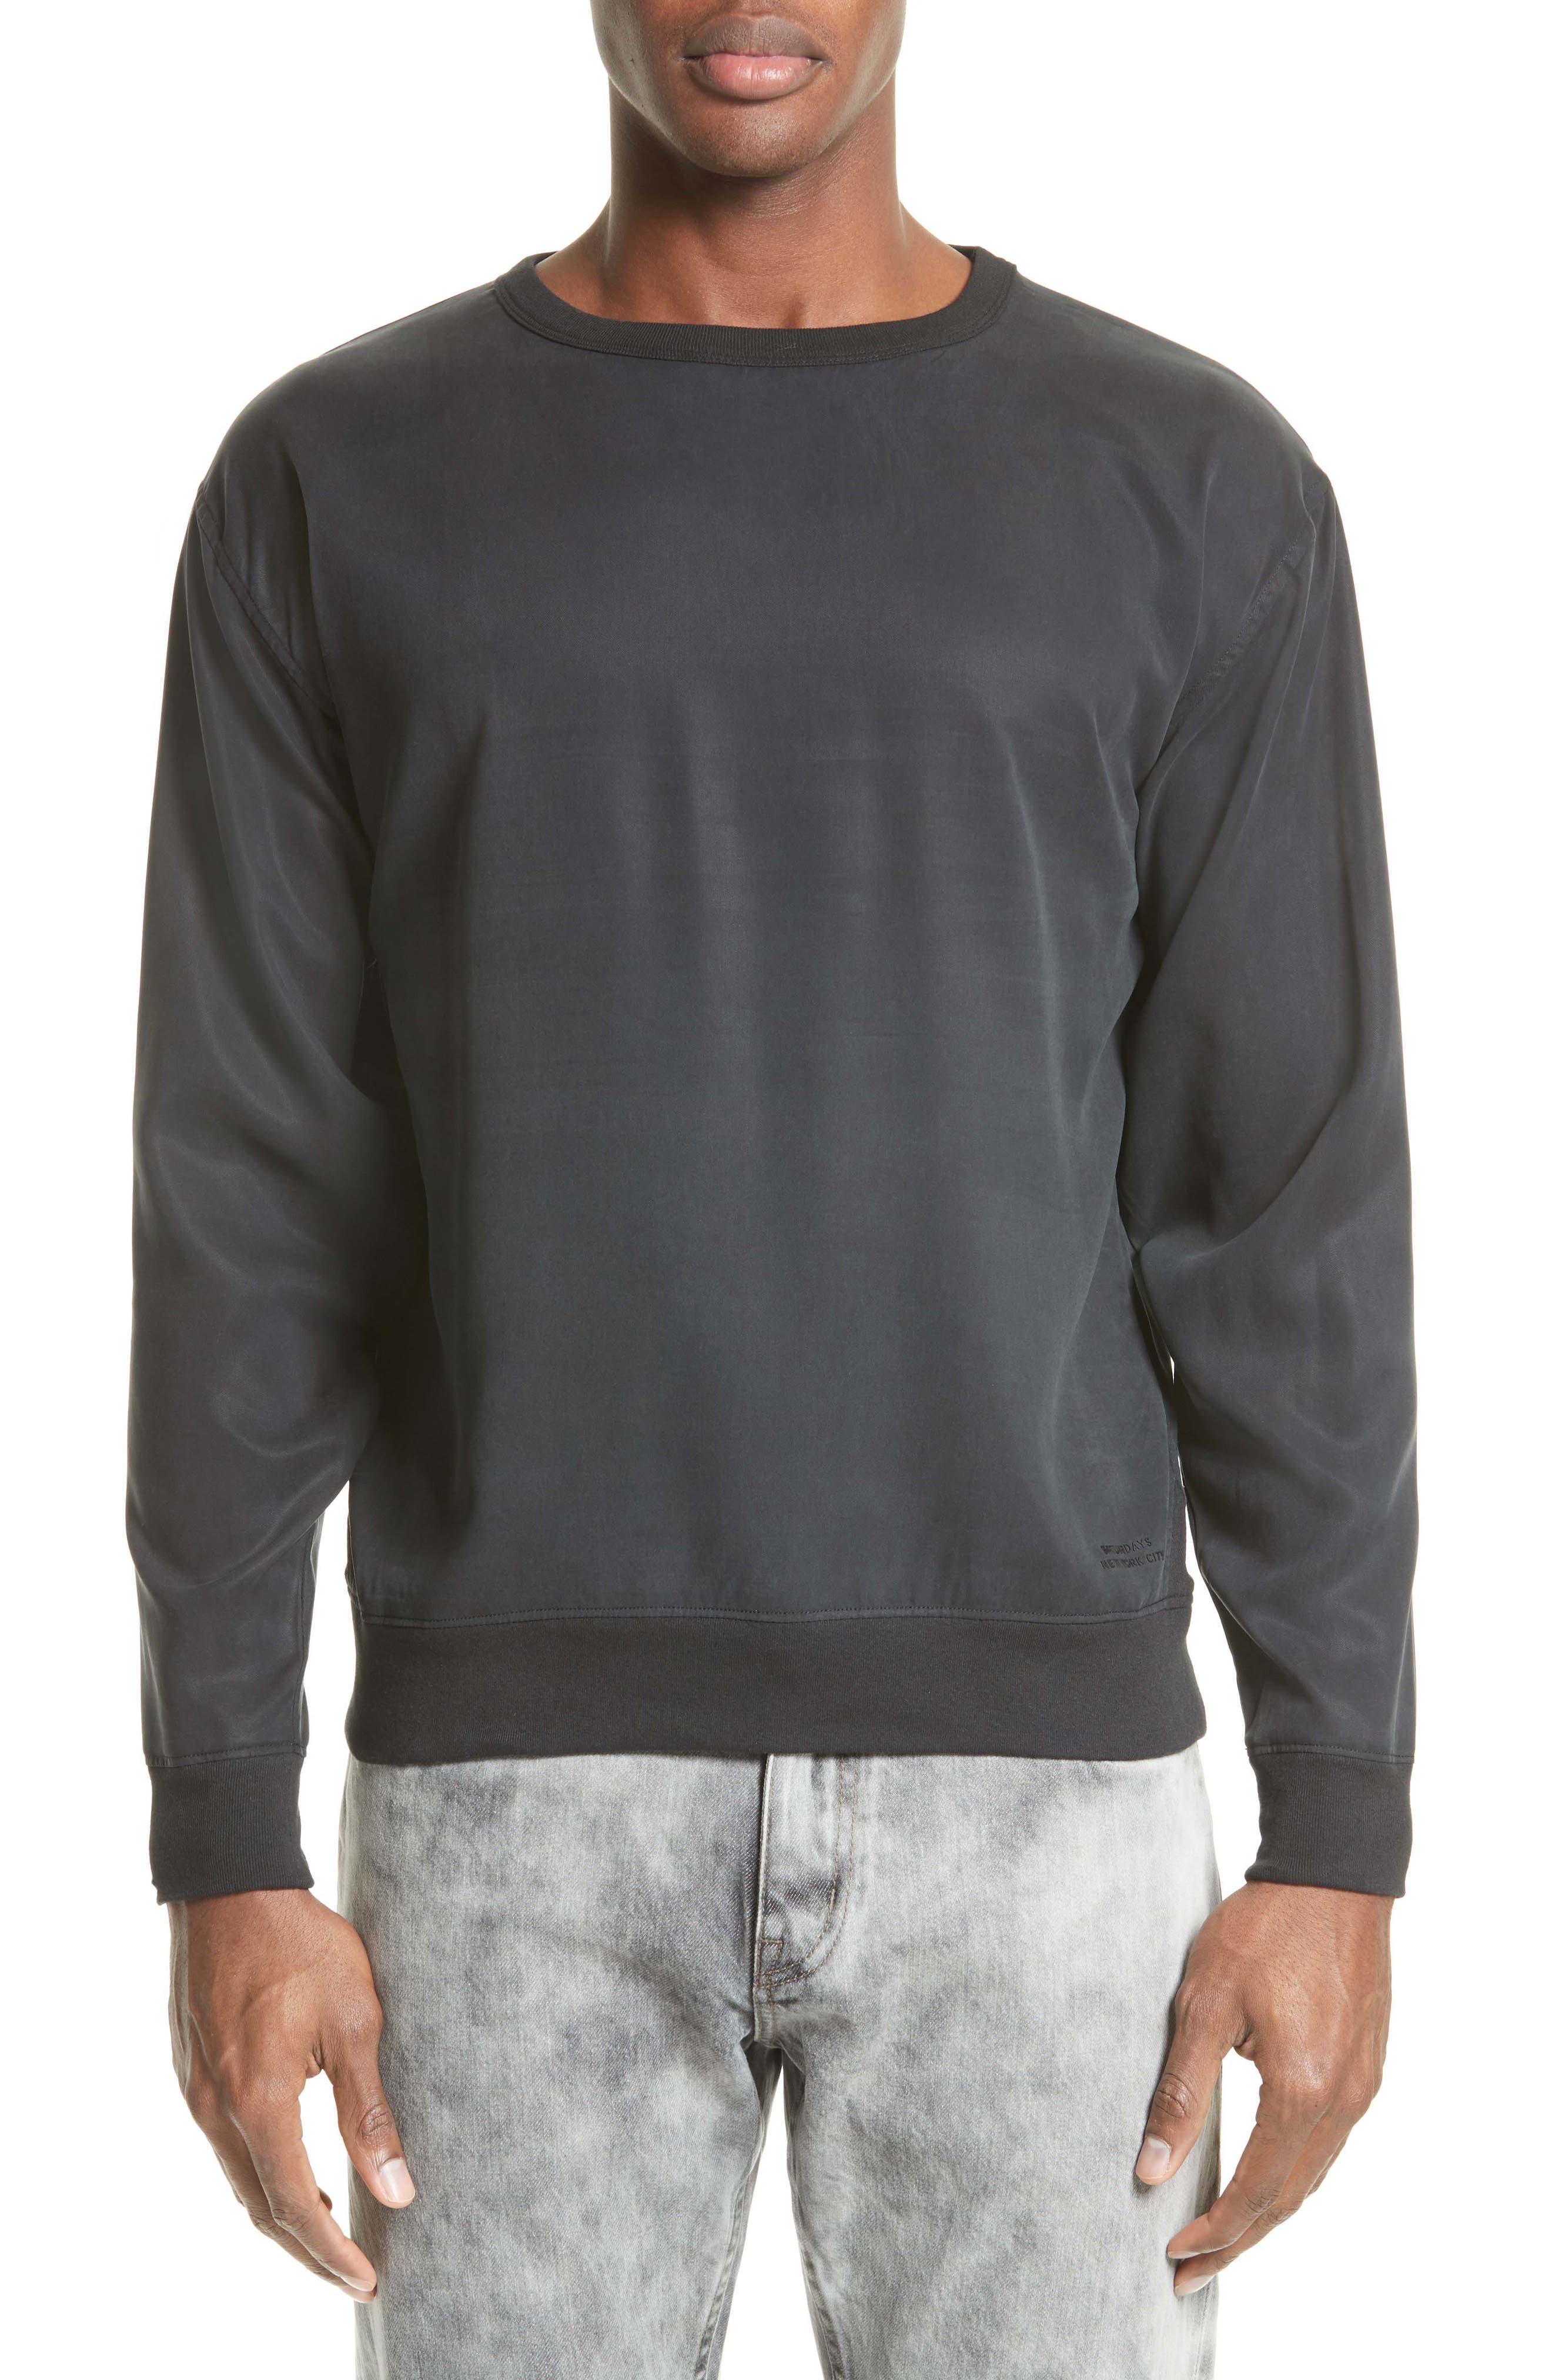 Duey Twill Crewneck Sweatshirt,                         Main,                         color, 001